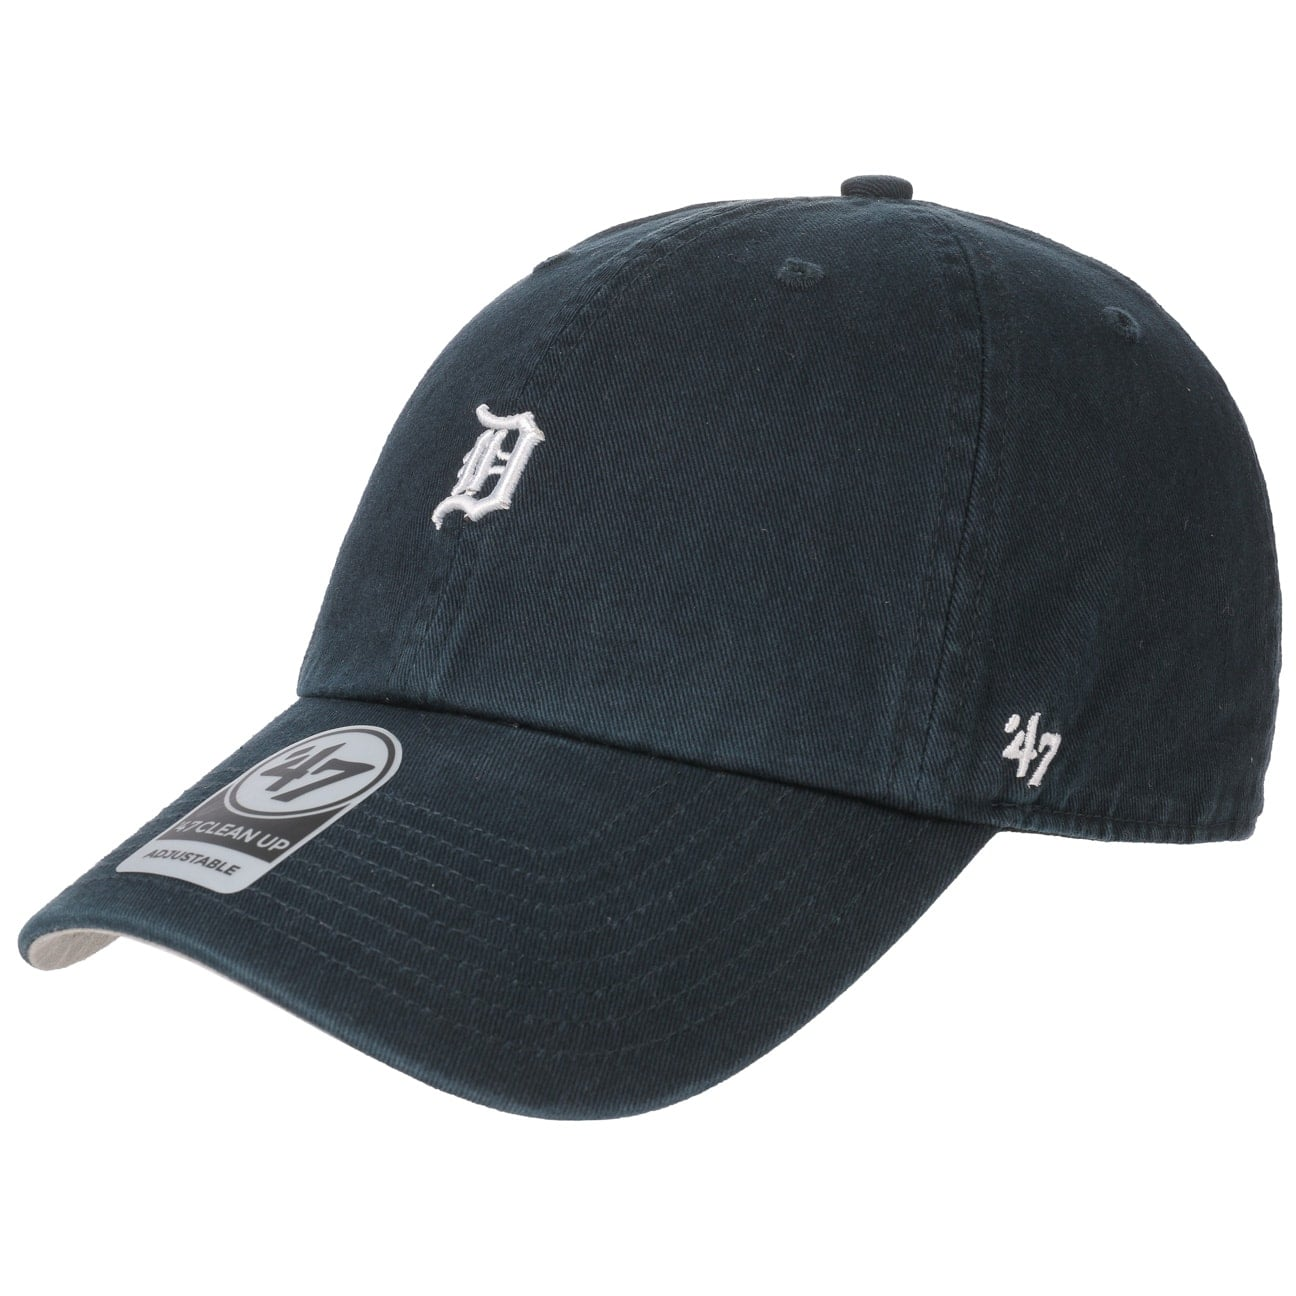 Gorra Abate Tigers Strapback by 47 Brand  gorra de baseball